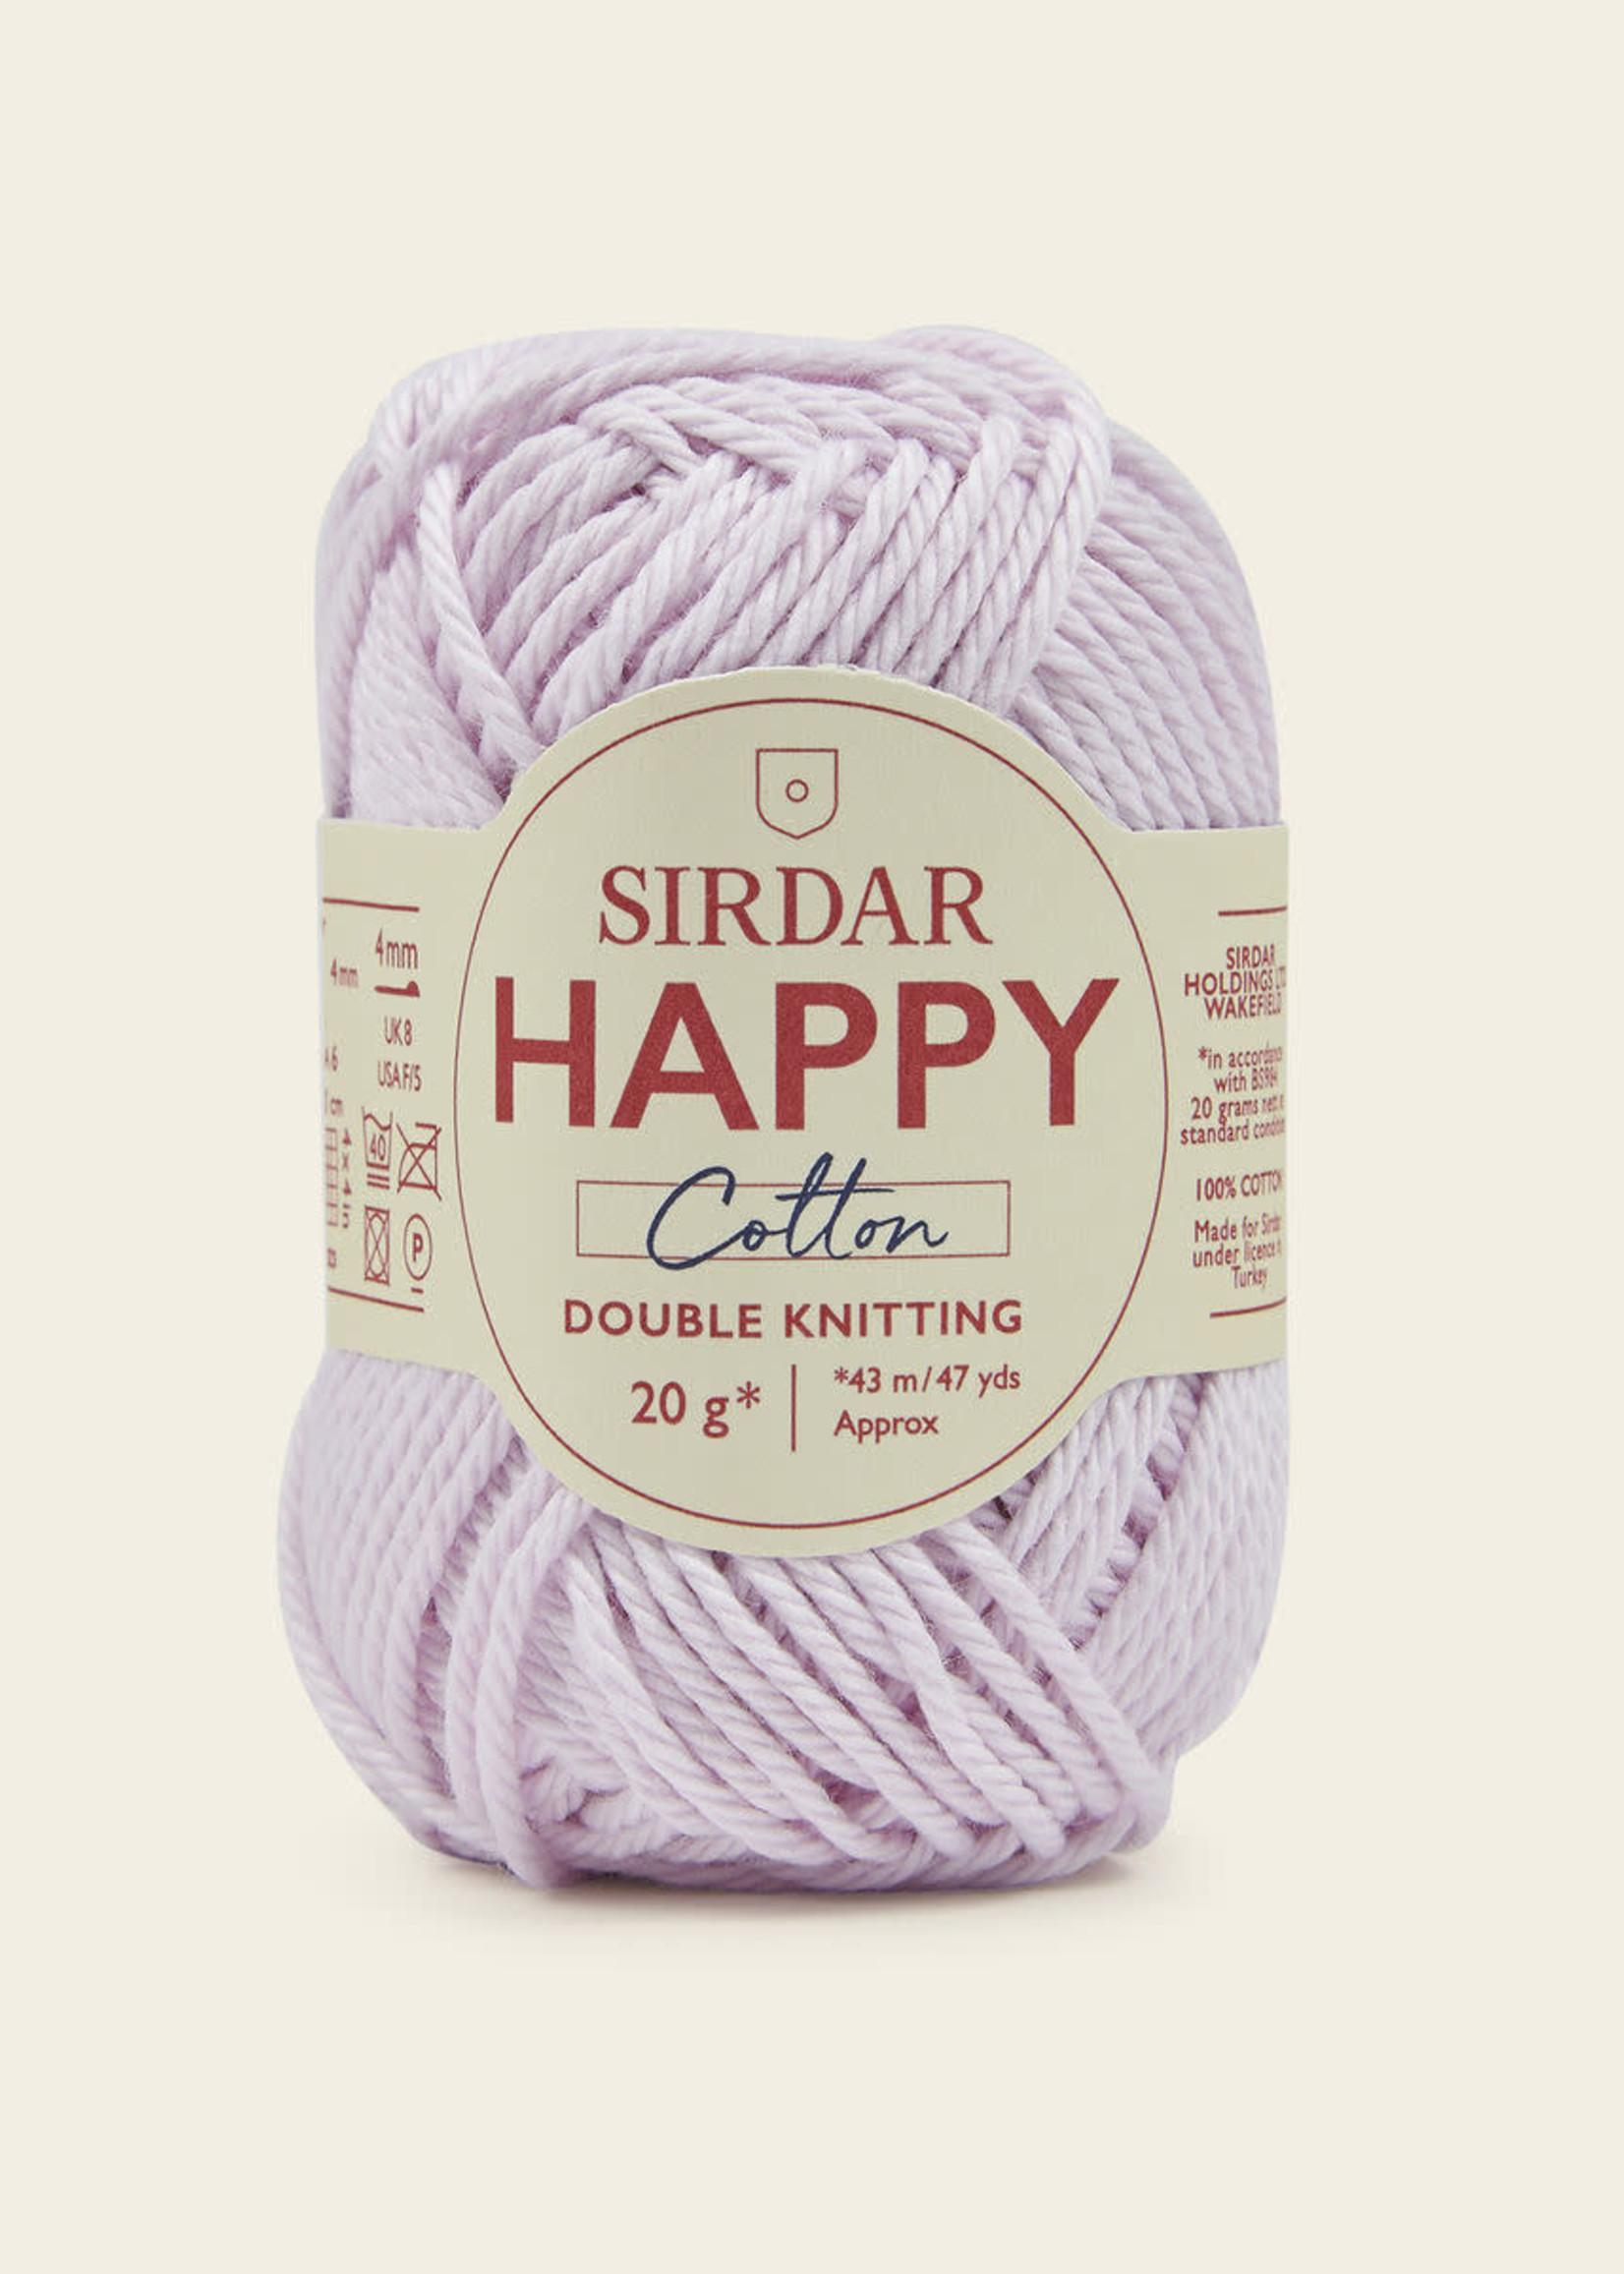 Sirdar Sirdar Happy Cotton #766 Frilly